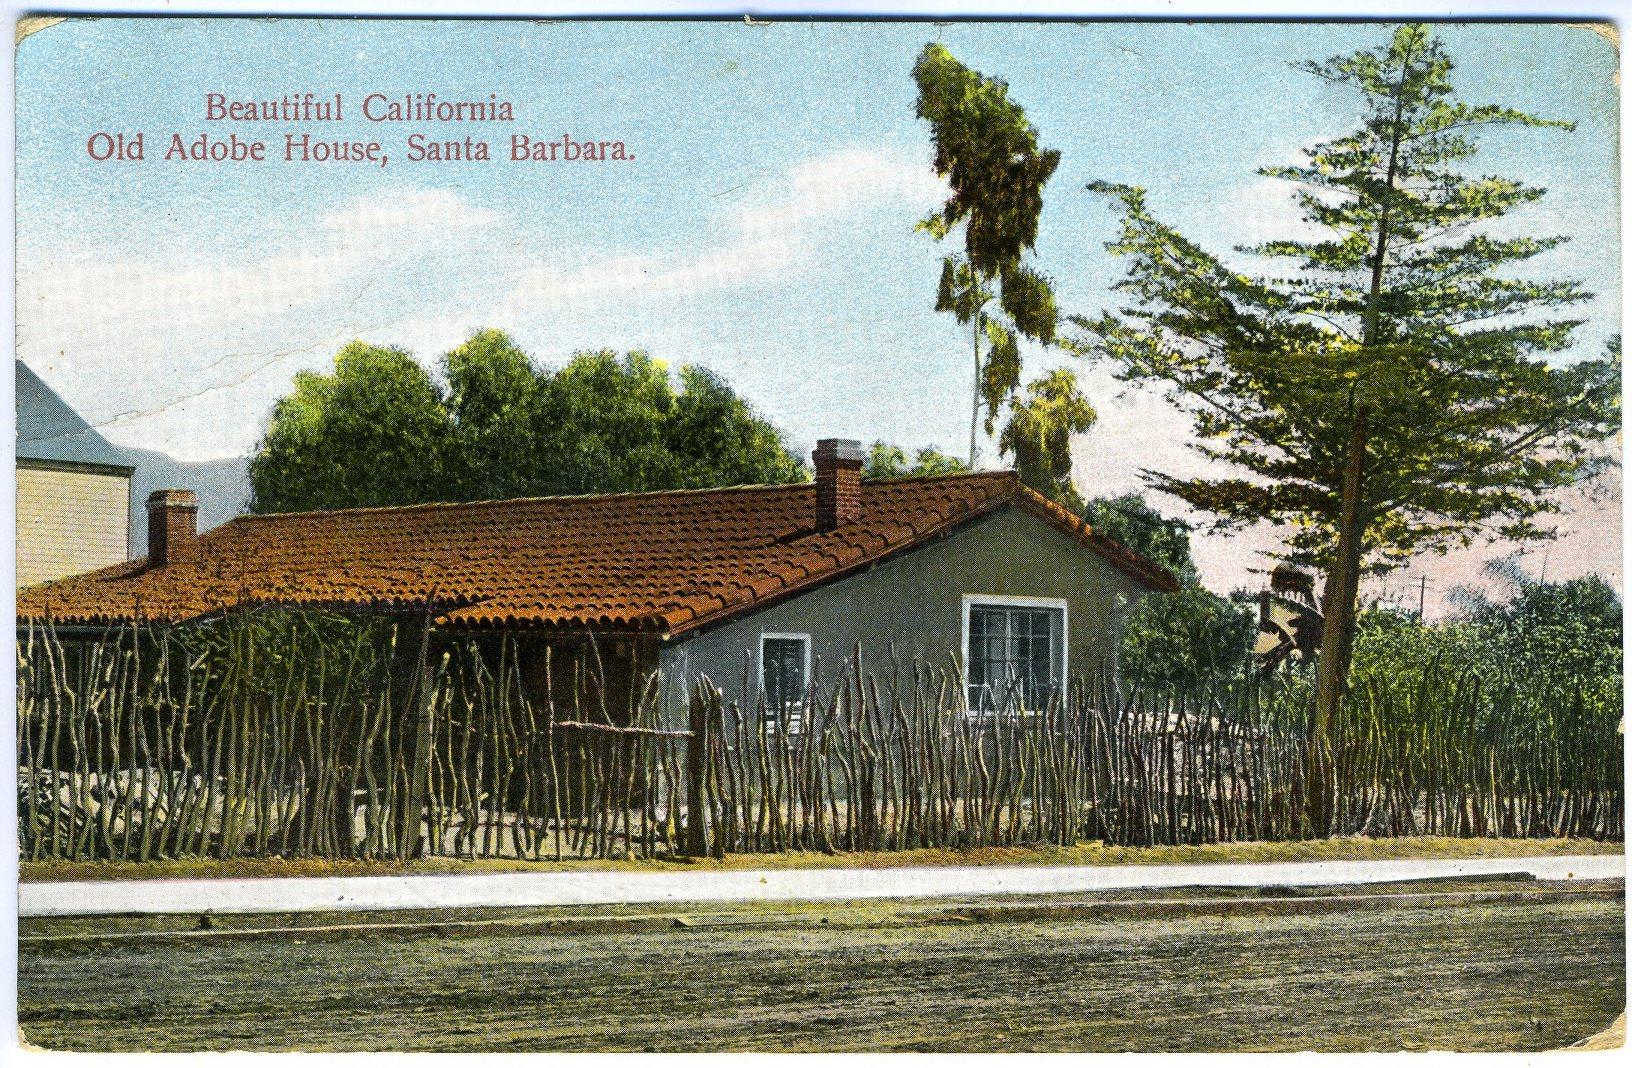 Historic Adobe, Anacapa Street postcard, SBHM 60.2